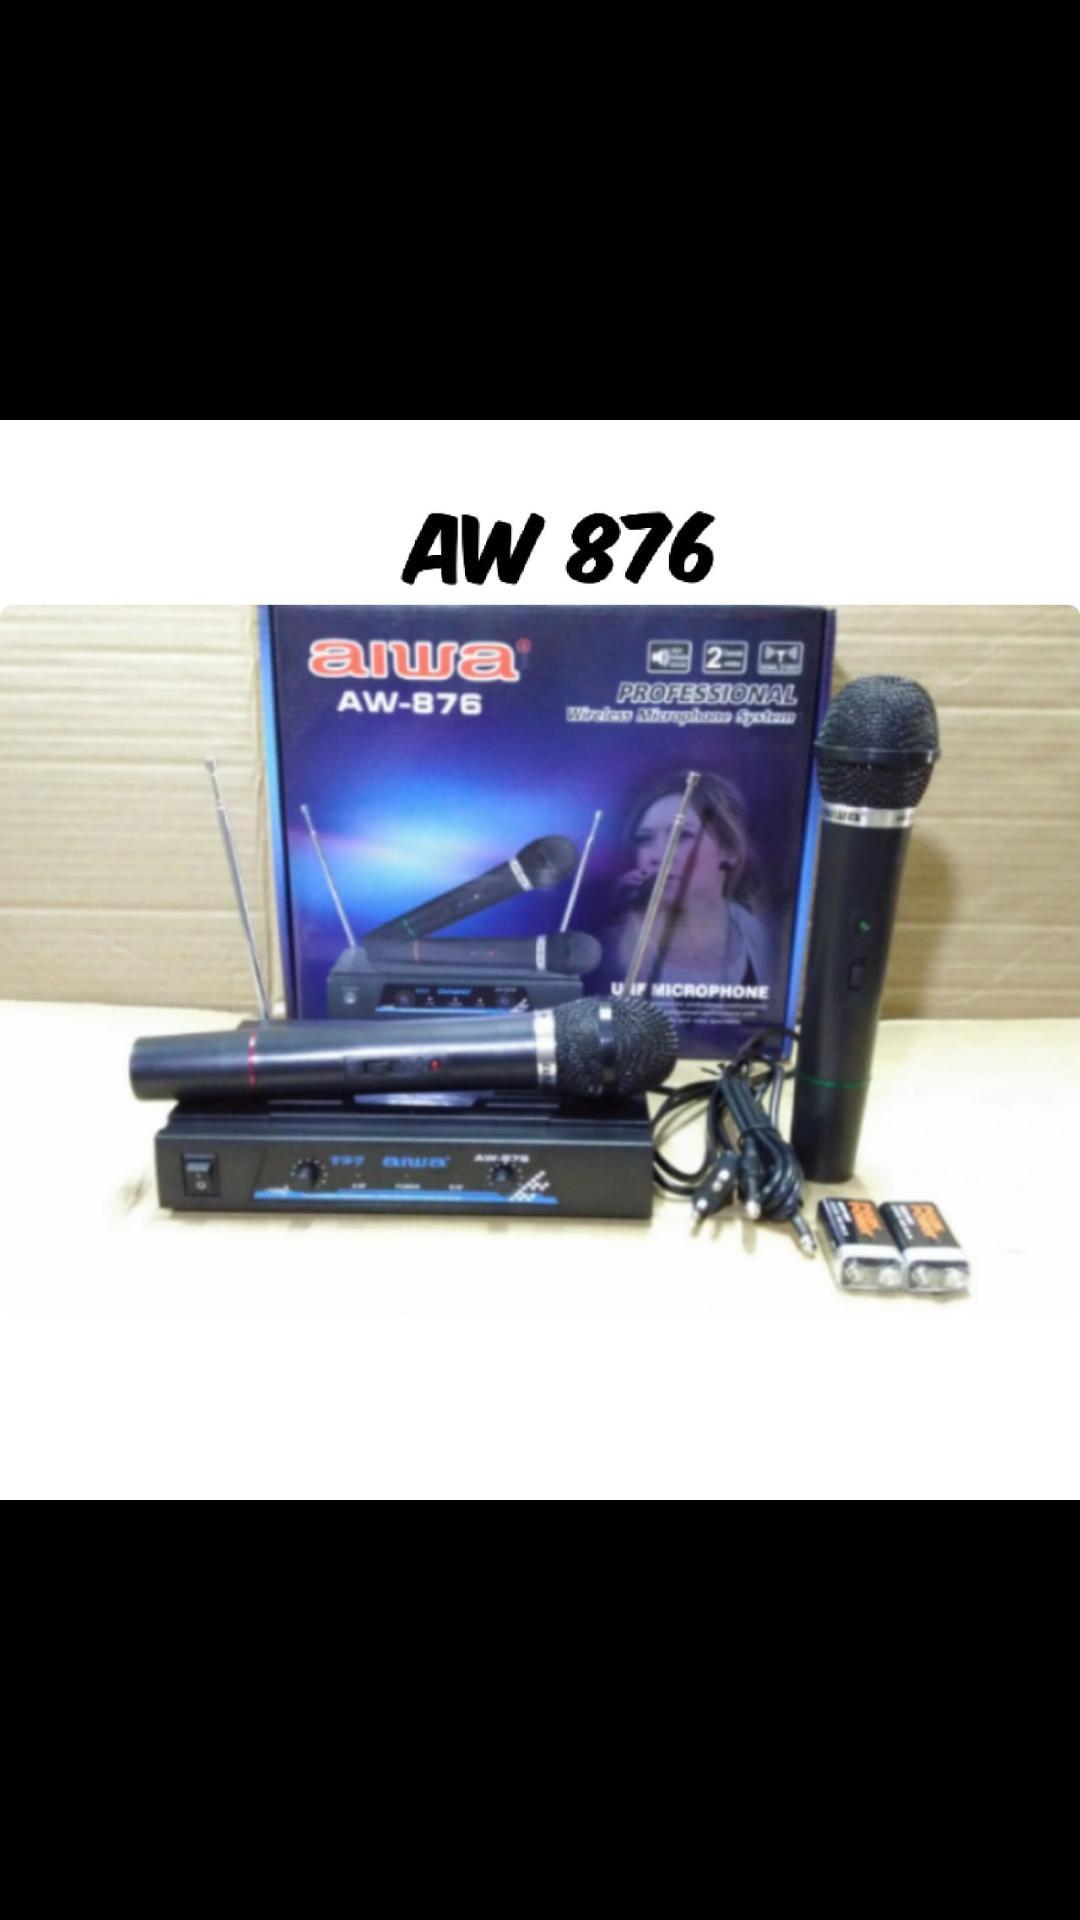 AIWA 867 Mic ORI wireless profesional uhf mik sepasang karaoke audio suara musik vokal artis EUT  1bh receiever 2bh mic pegang 1bh kabel audio output jarak bisa pakai sampe 20- 40METERAN suara bagus, jernih dan empuk cocok buat karaoke, MC, pidato